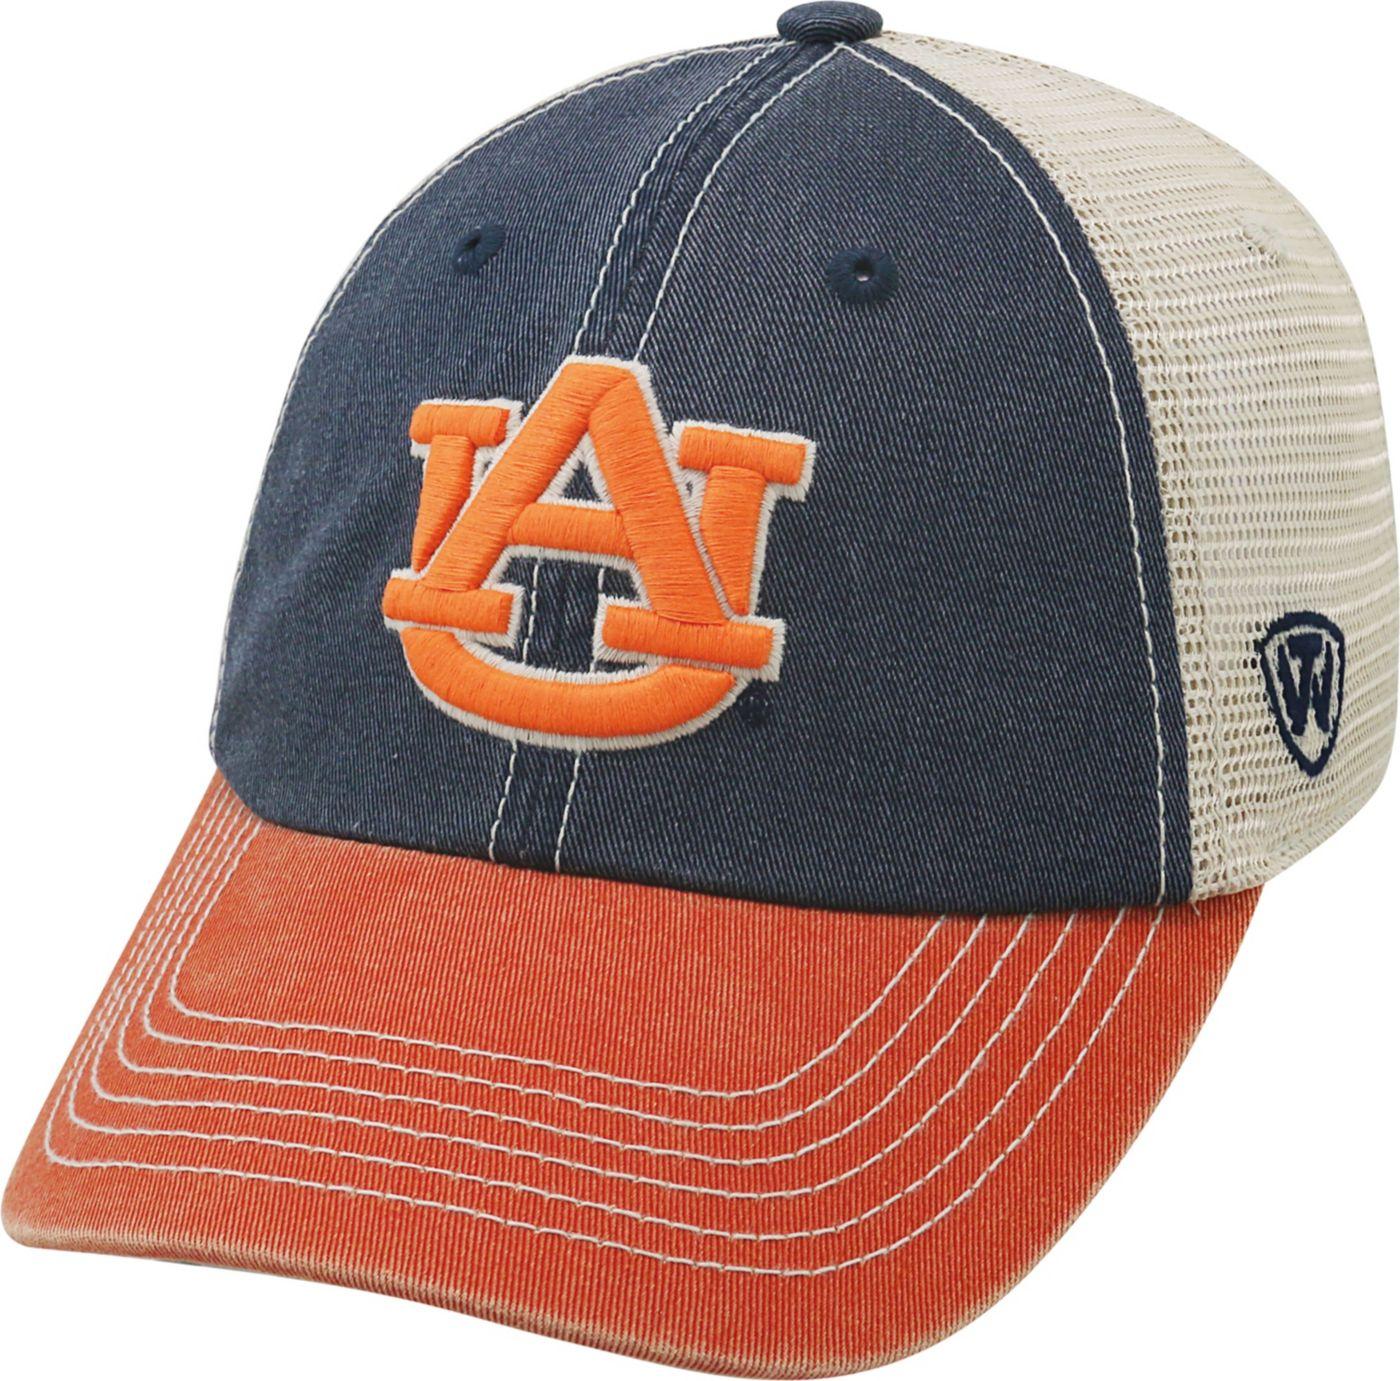 Top of the World Men's Auburn Tigers Blue/White/Orange Off Road Adjustable Hat